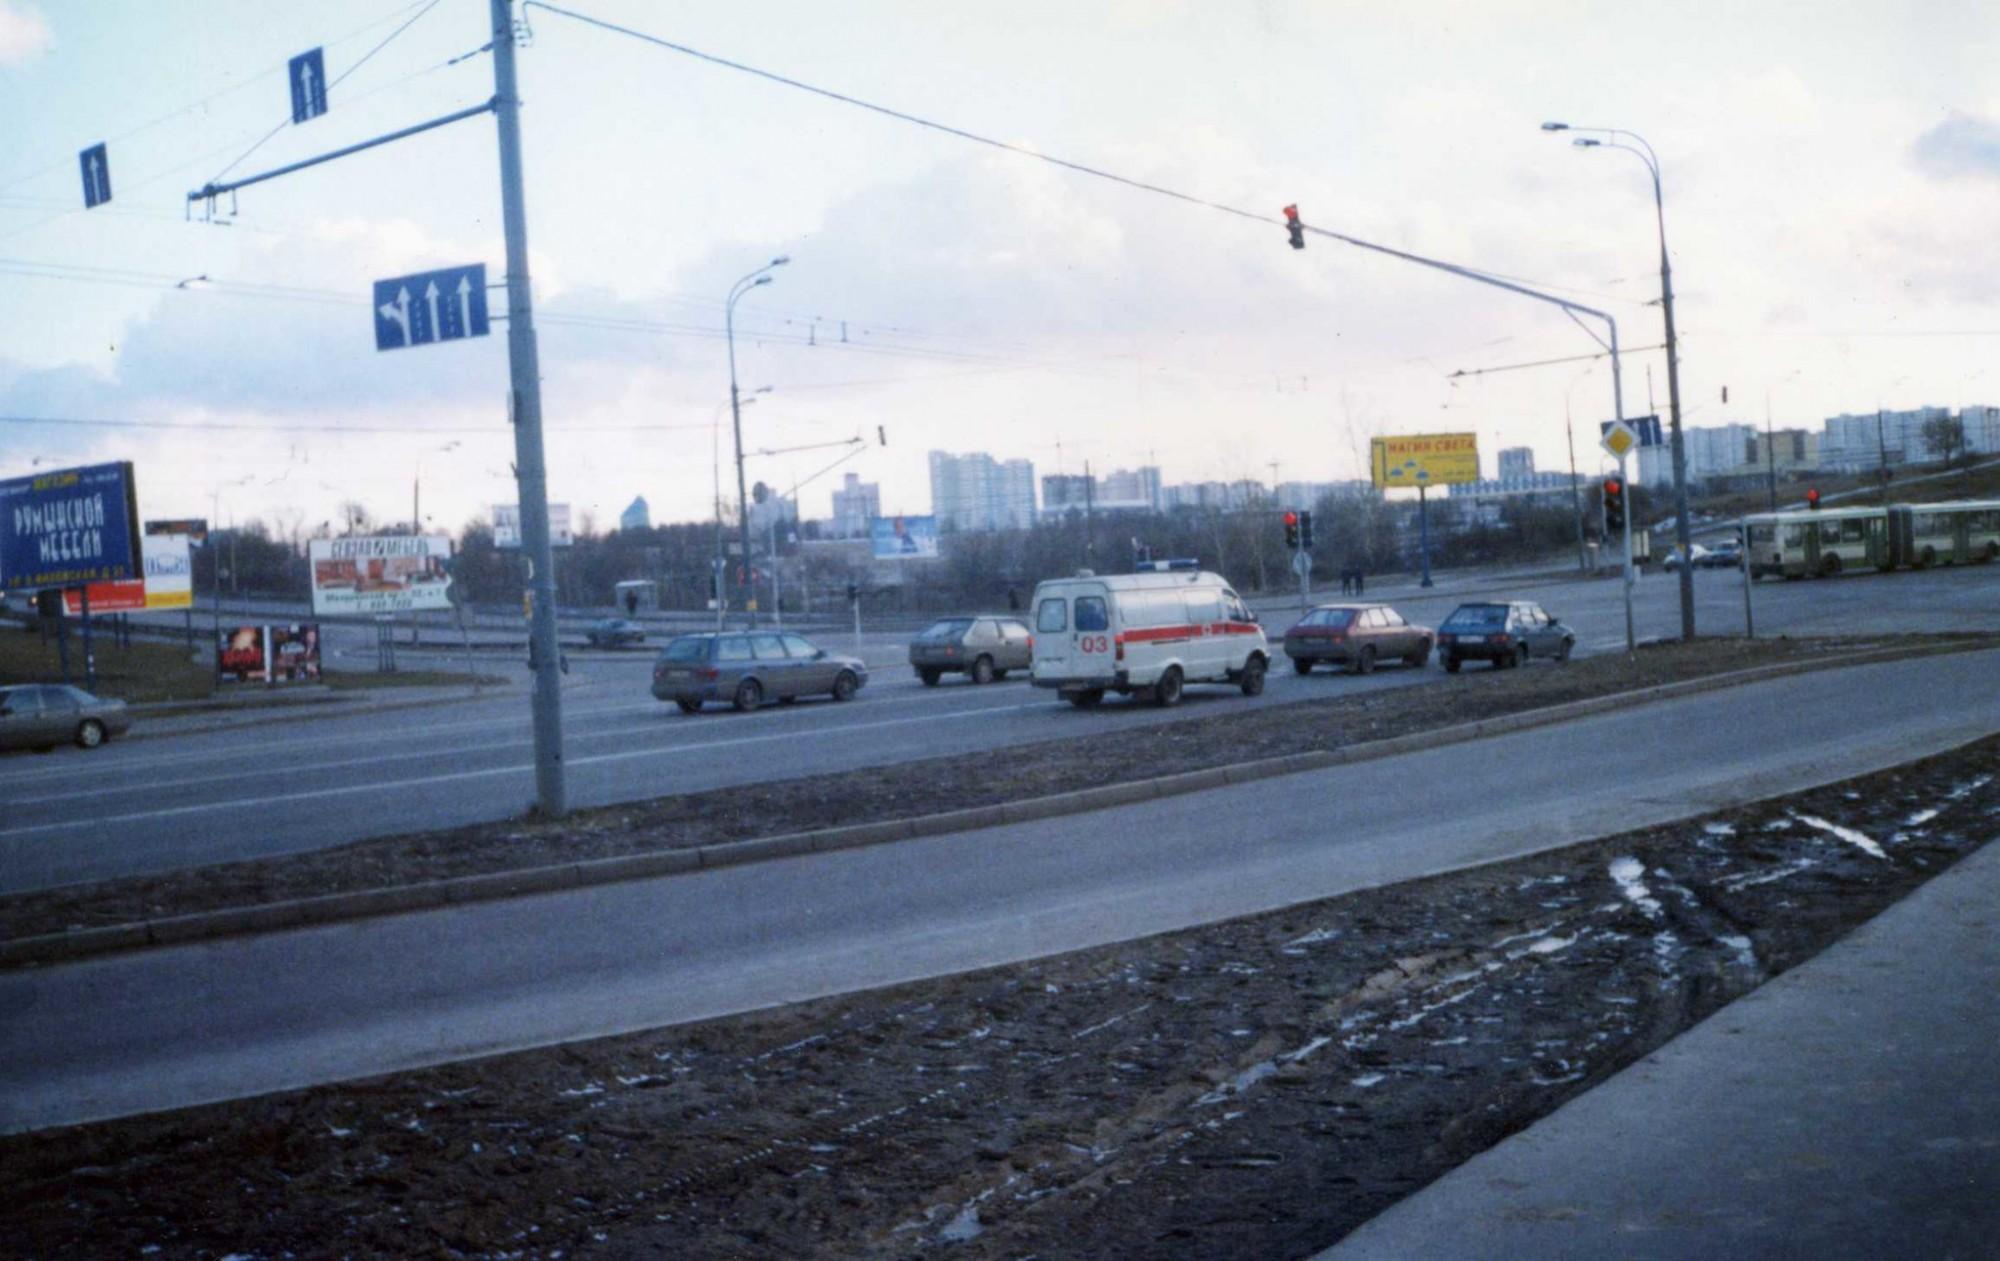 2002 Олимпийская деревня (080302). Mazgayob